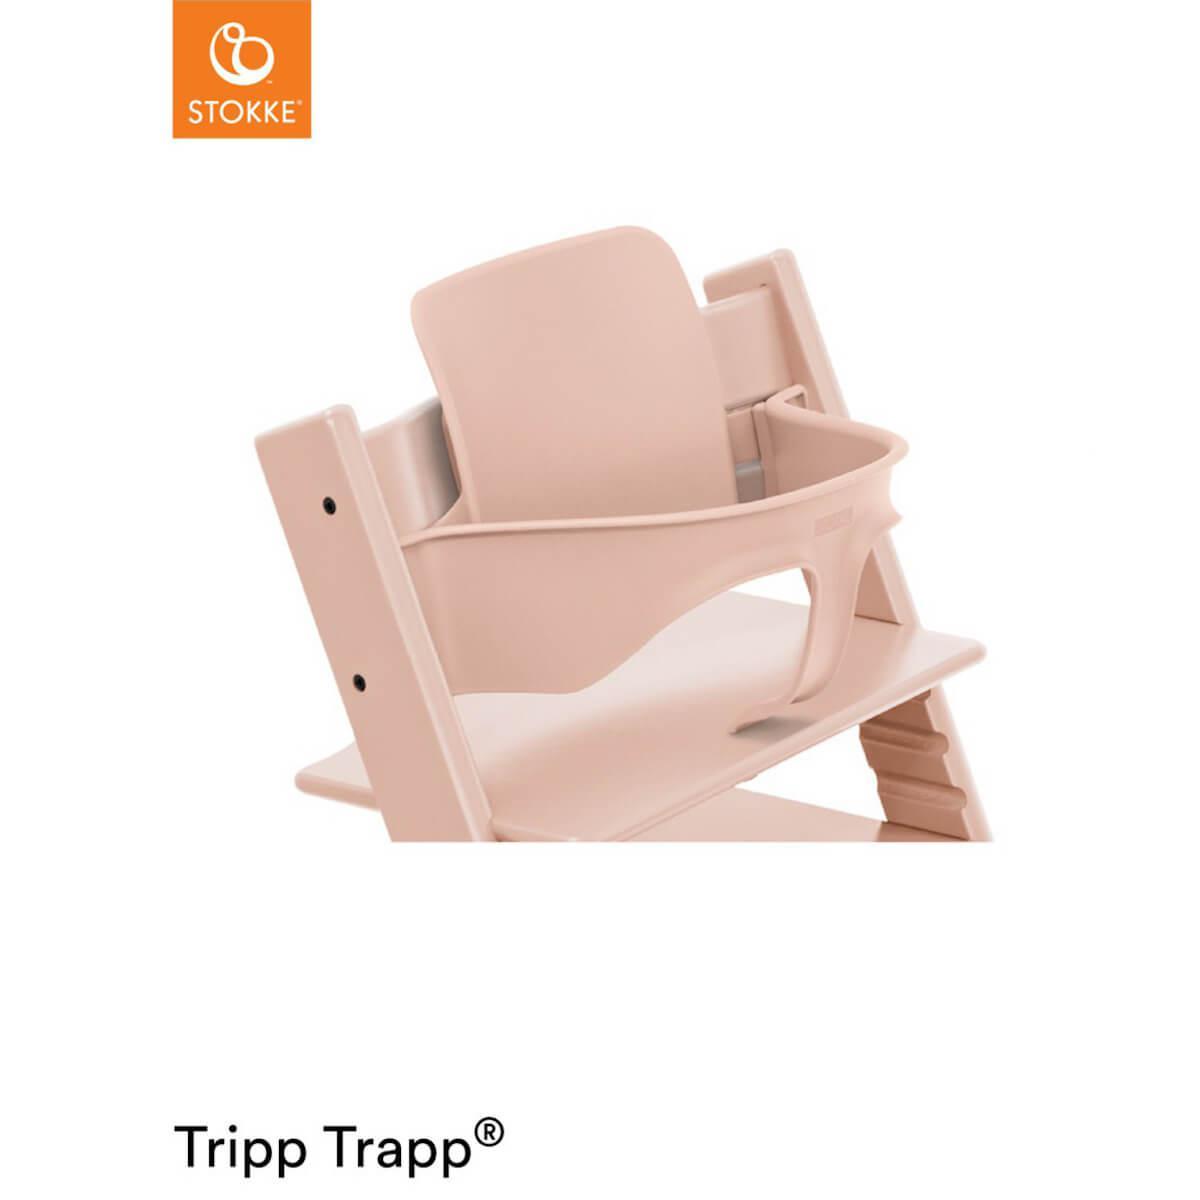 Baby set trona bebé TRIPP TRAPP Stokke serene rosa